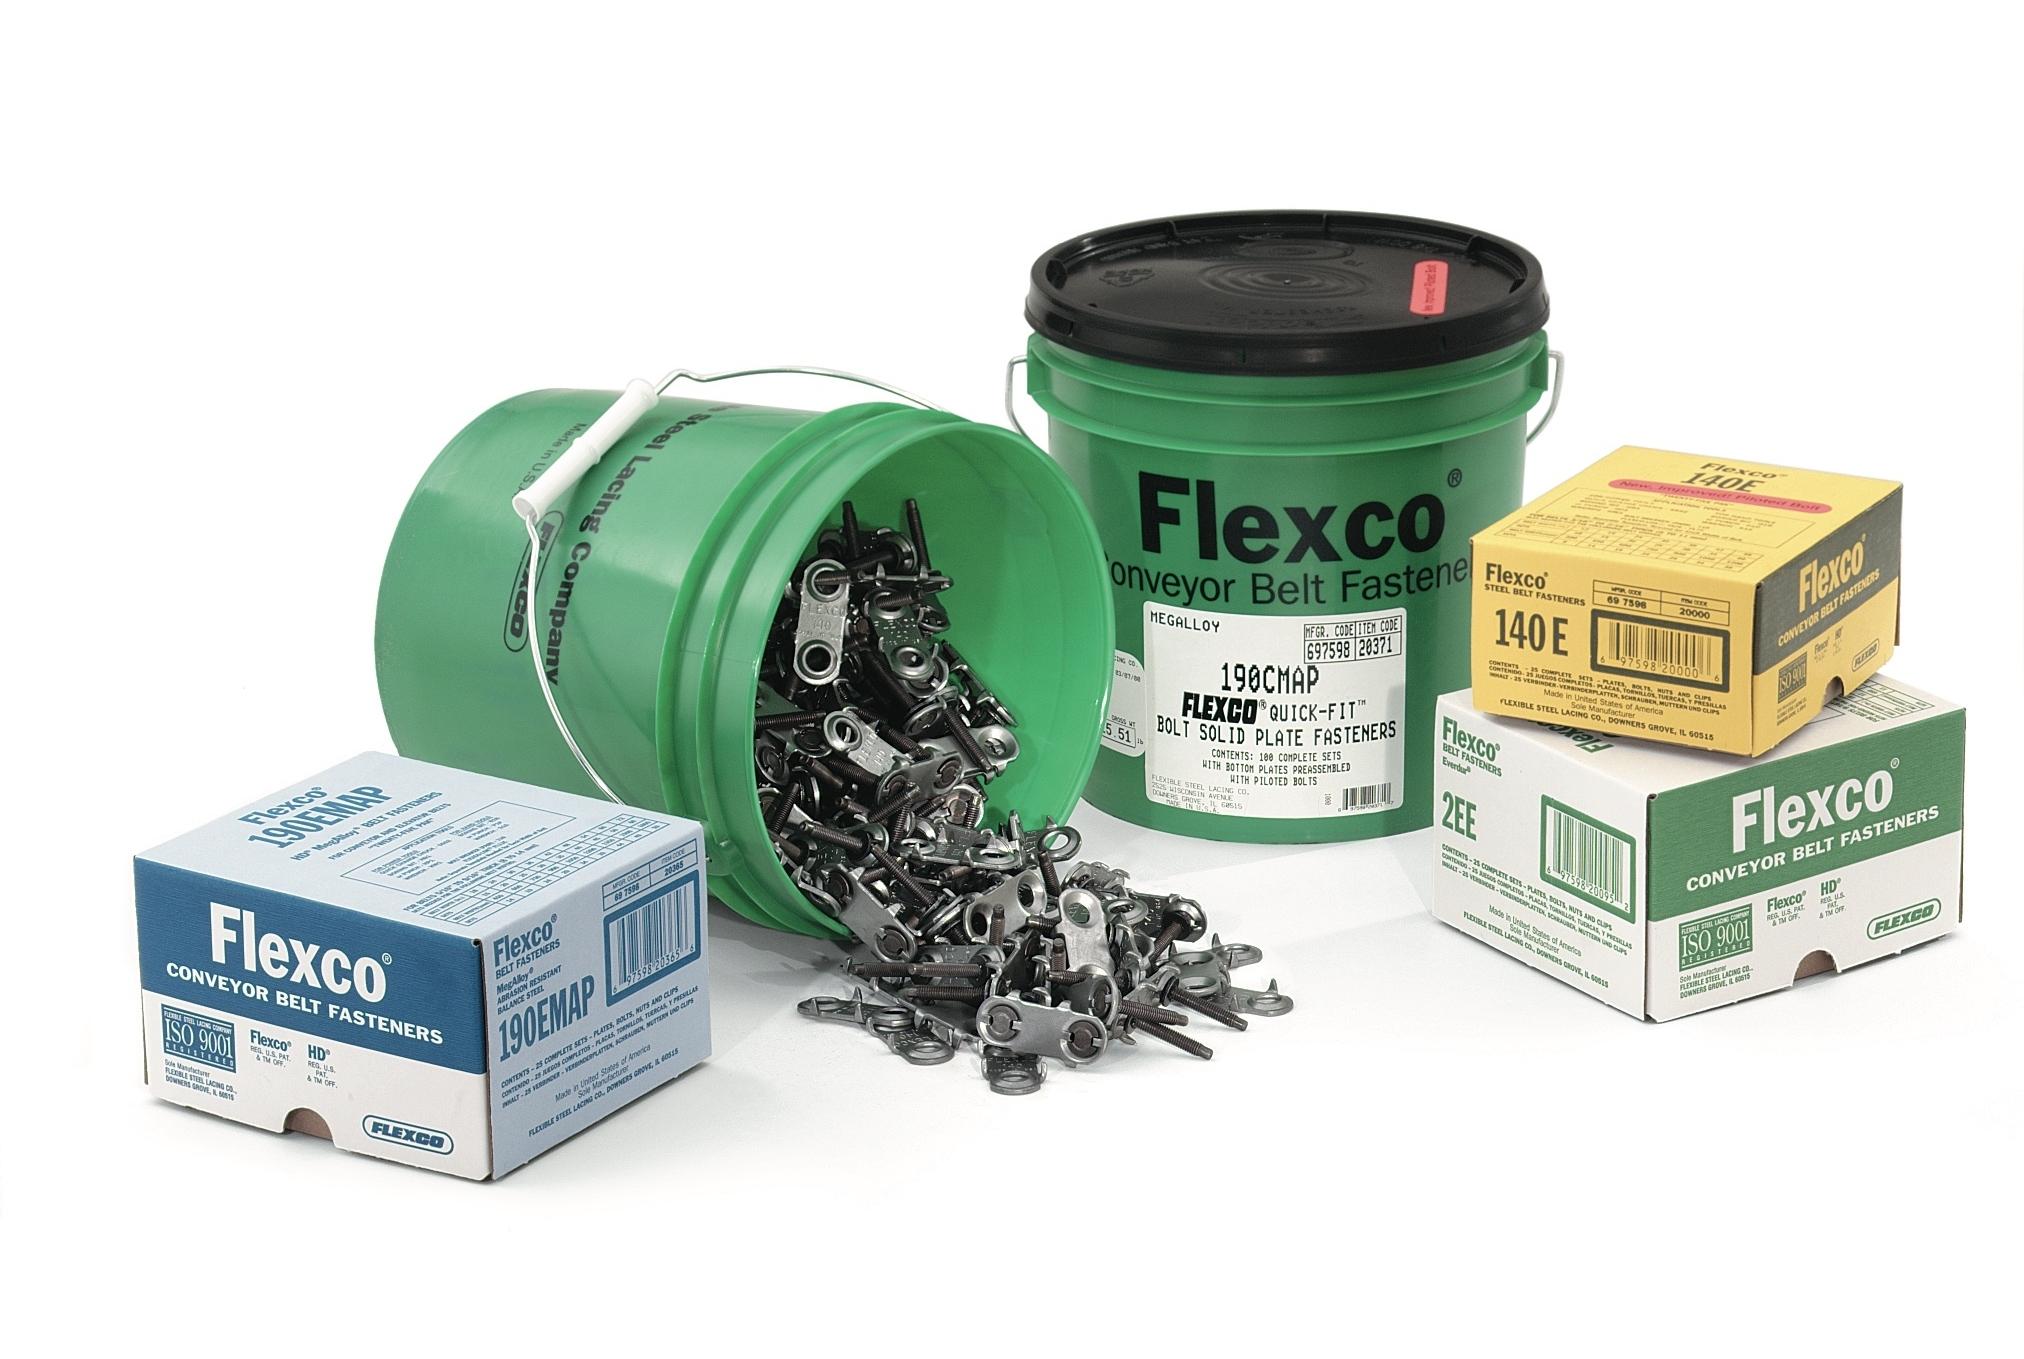 flexco.jpg